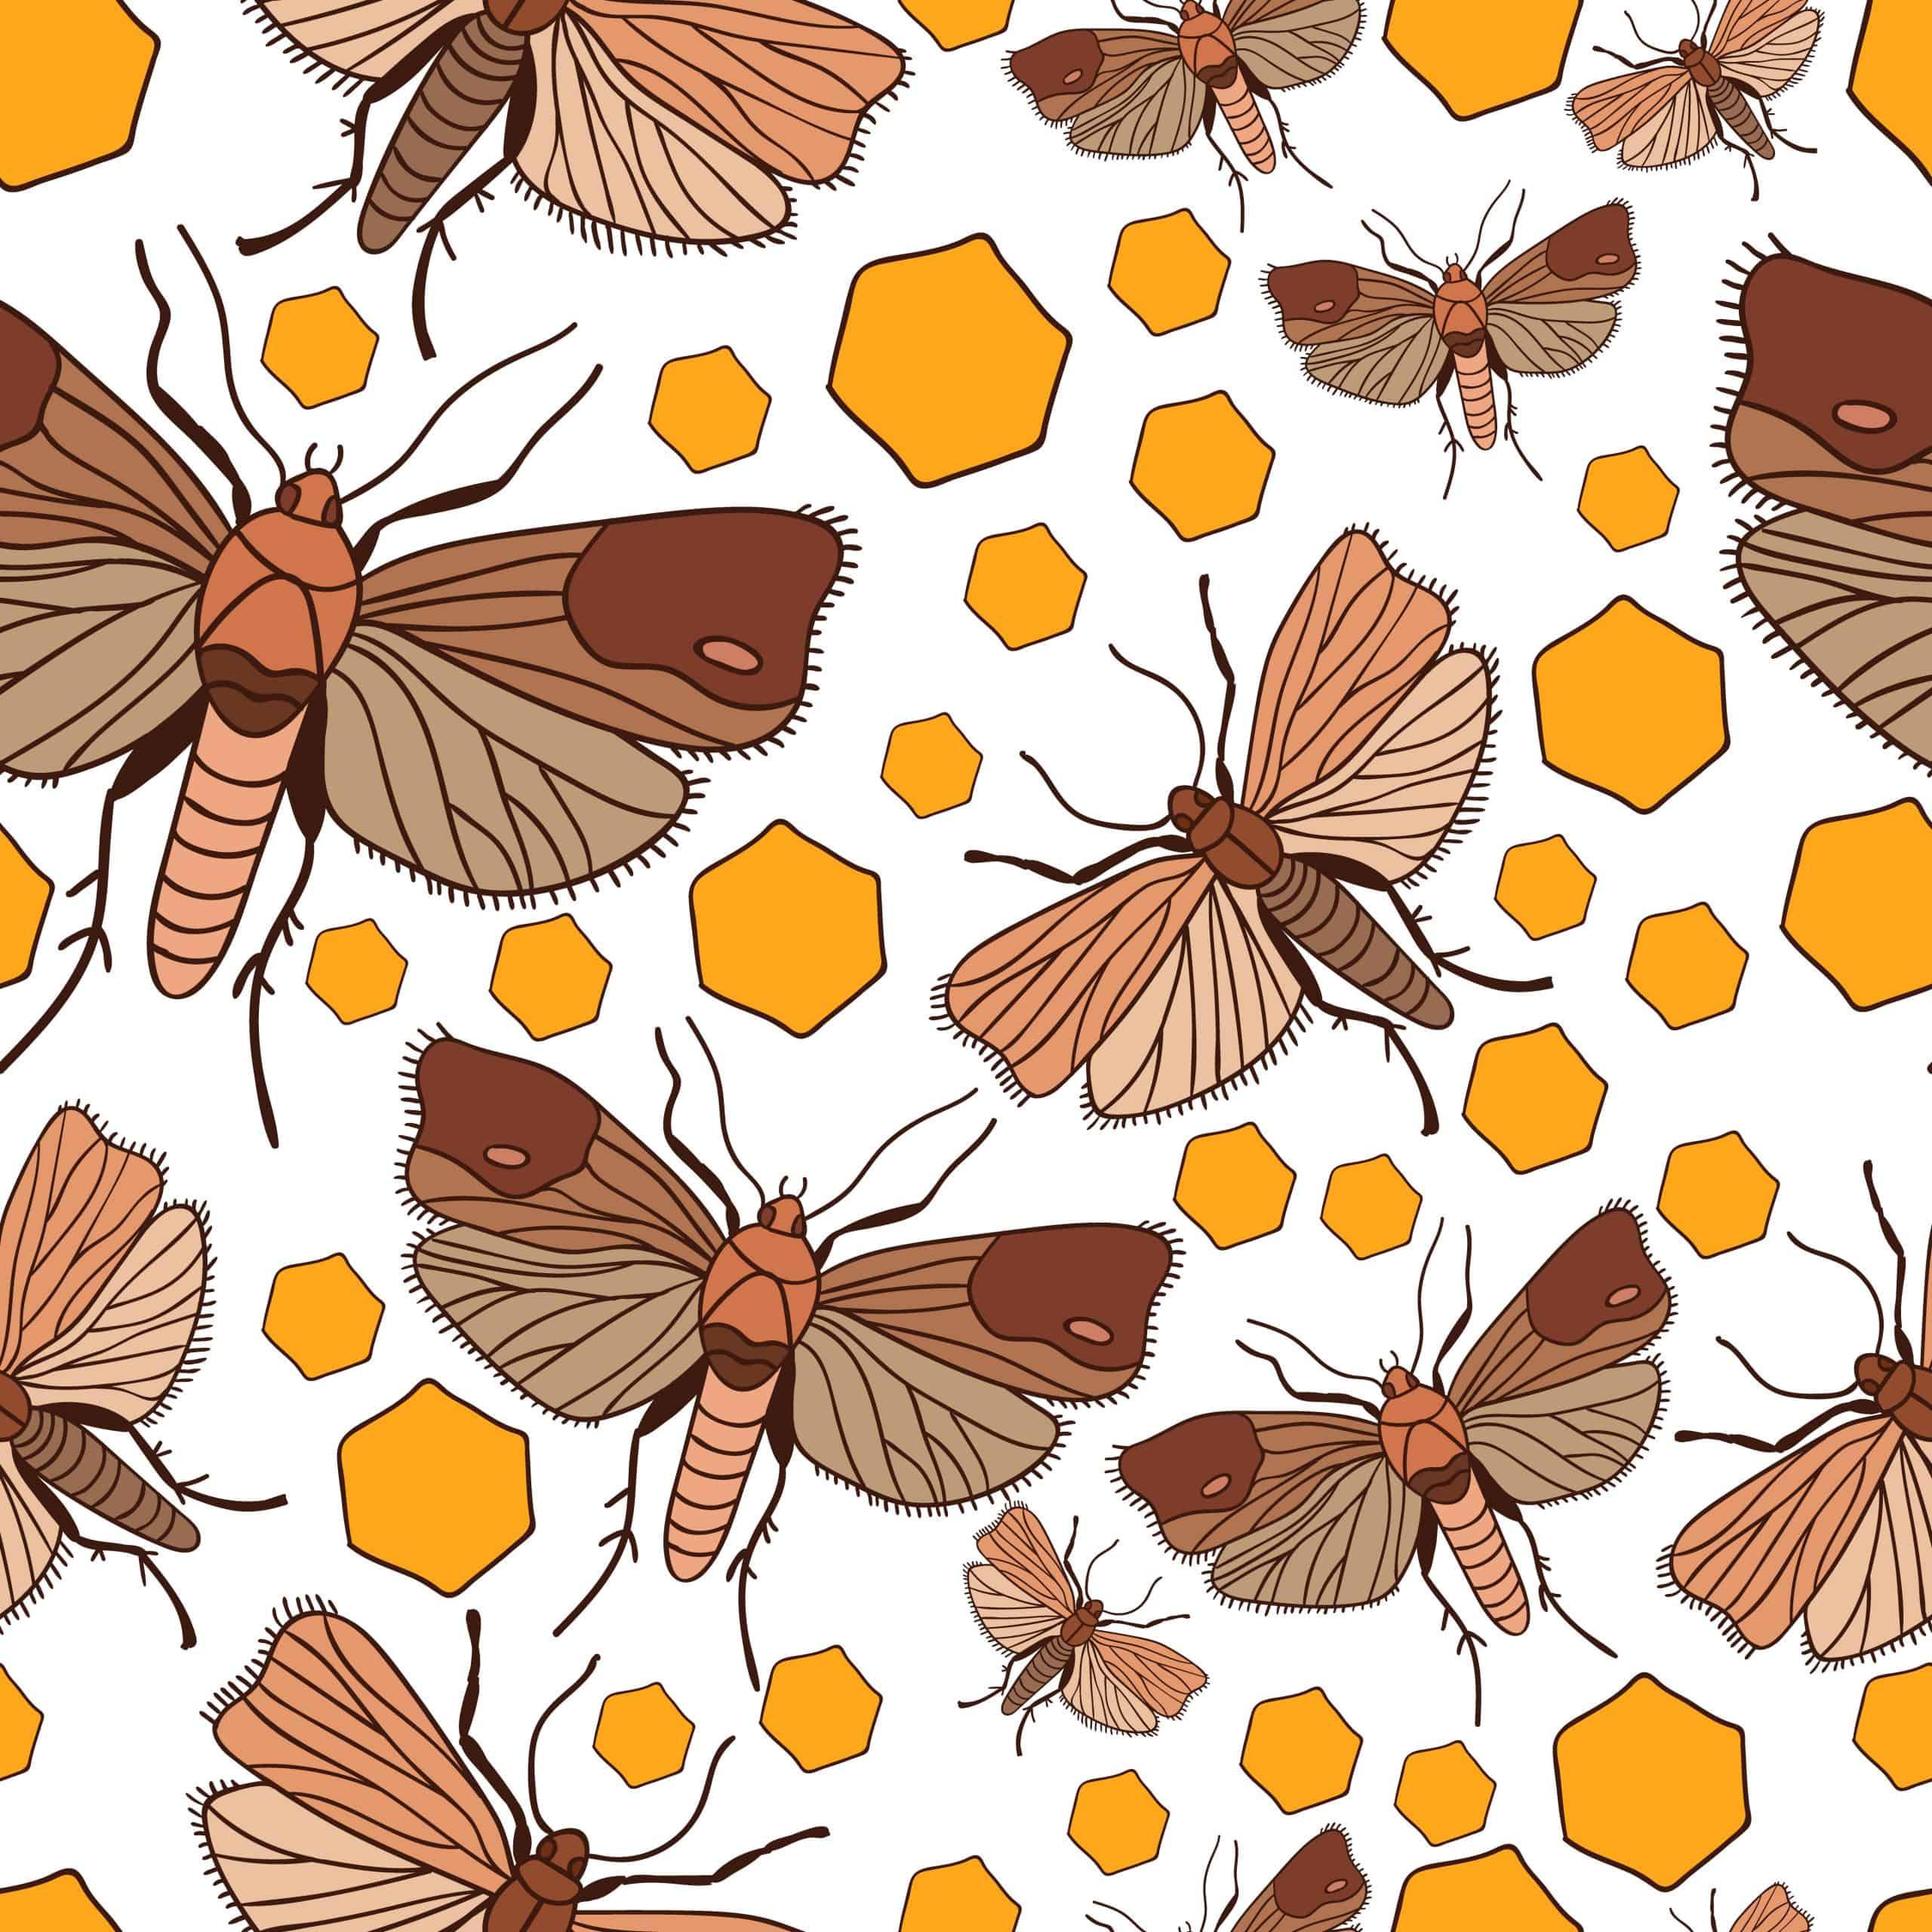 wax moth traps